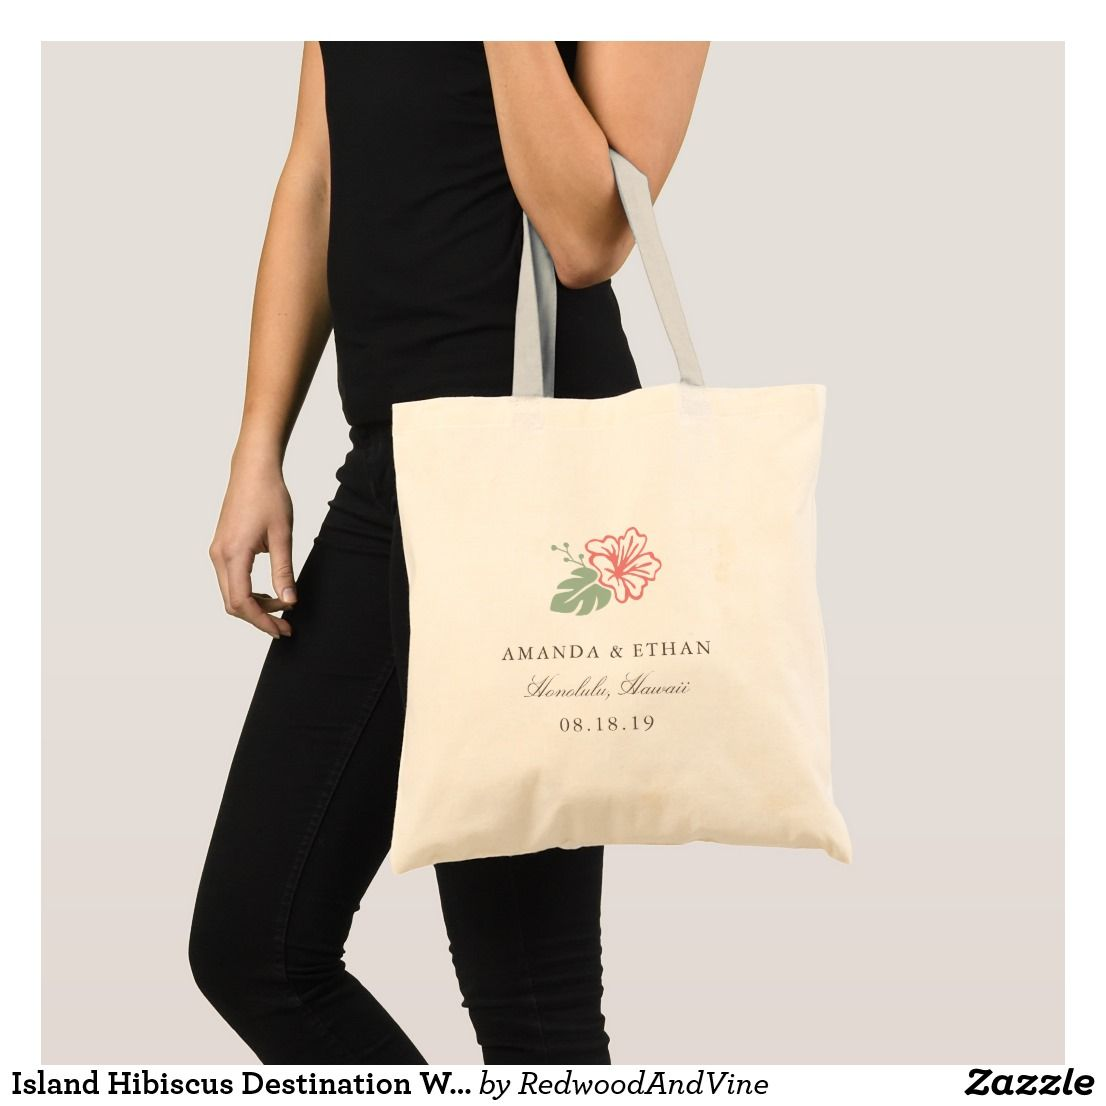 Island Hibiscus Destination Wedding Favor Tote Bag | Wedding:Tote ...